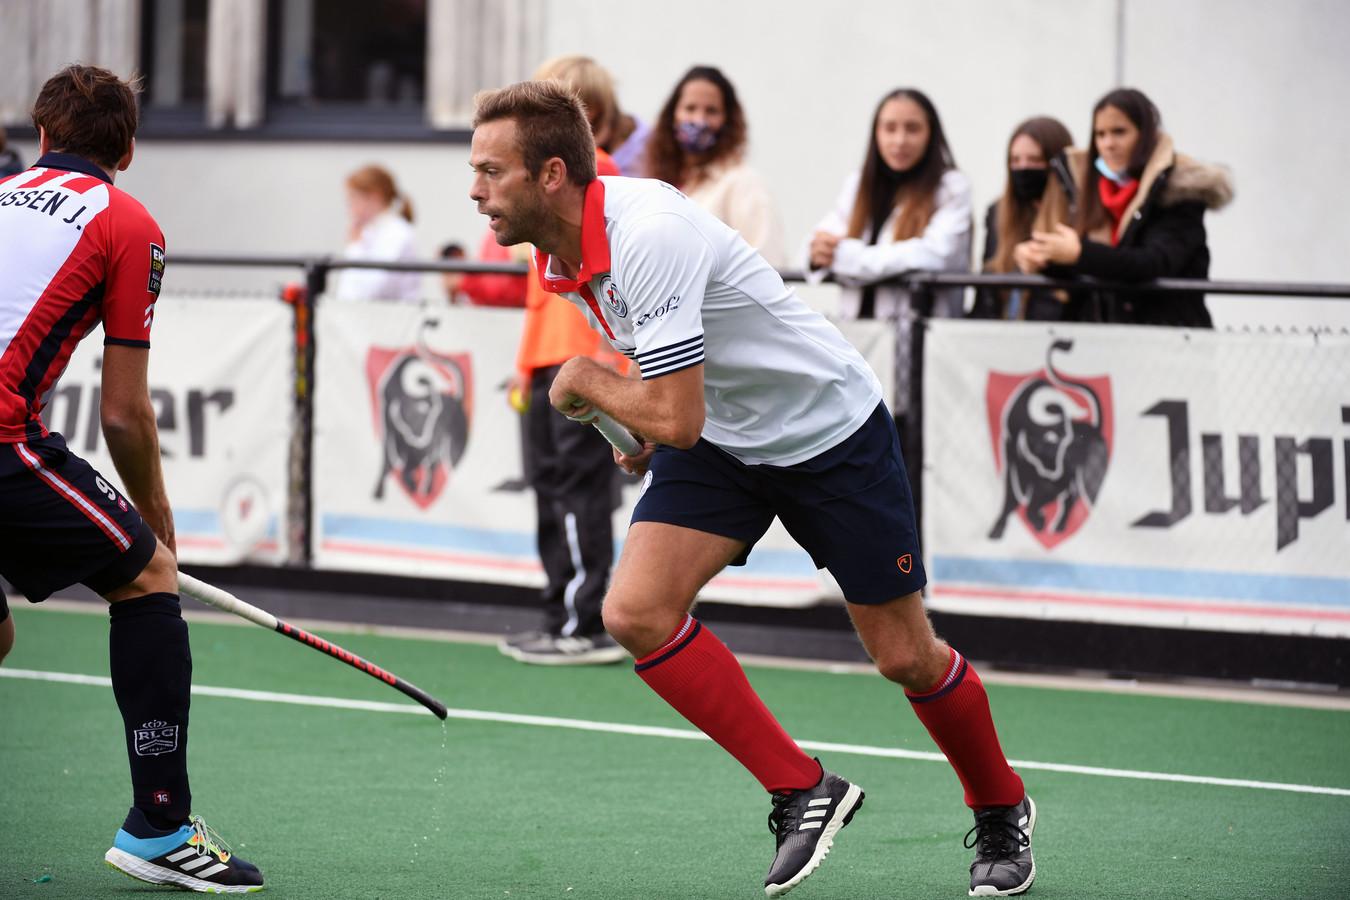 Jerome Dekeyser is nu coach bij KHC Hockey Leuven.